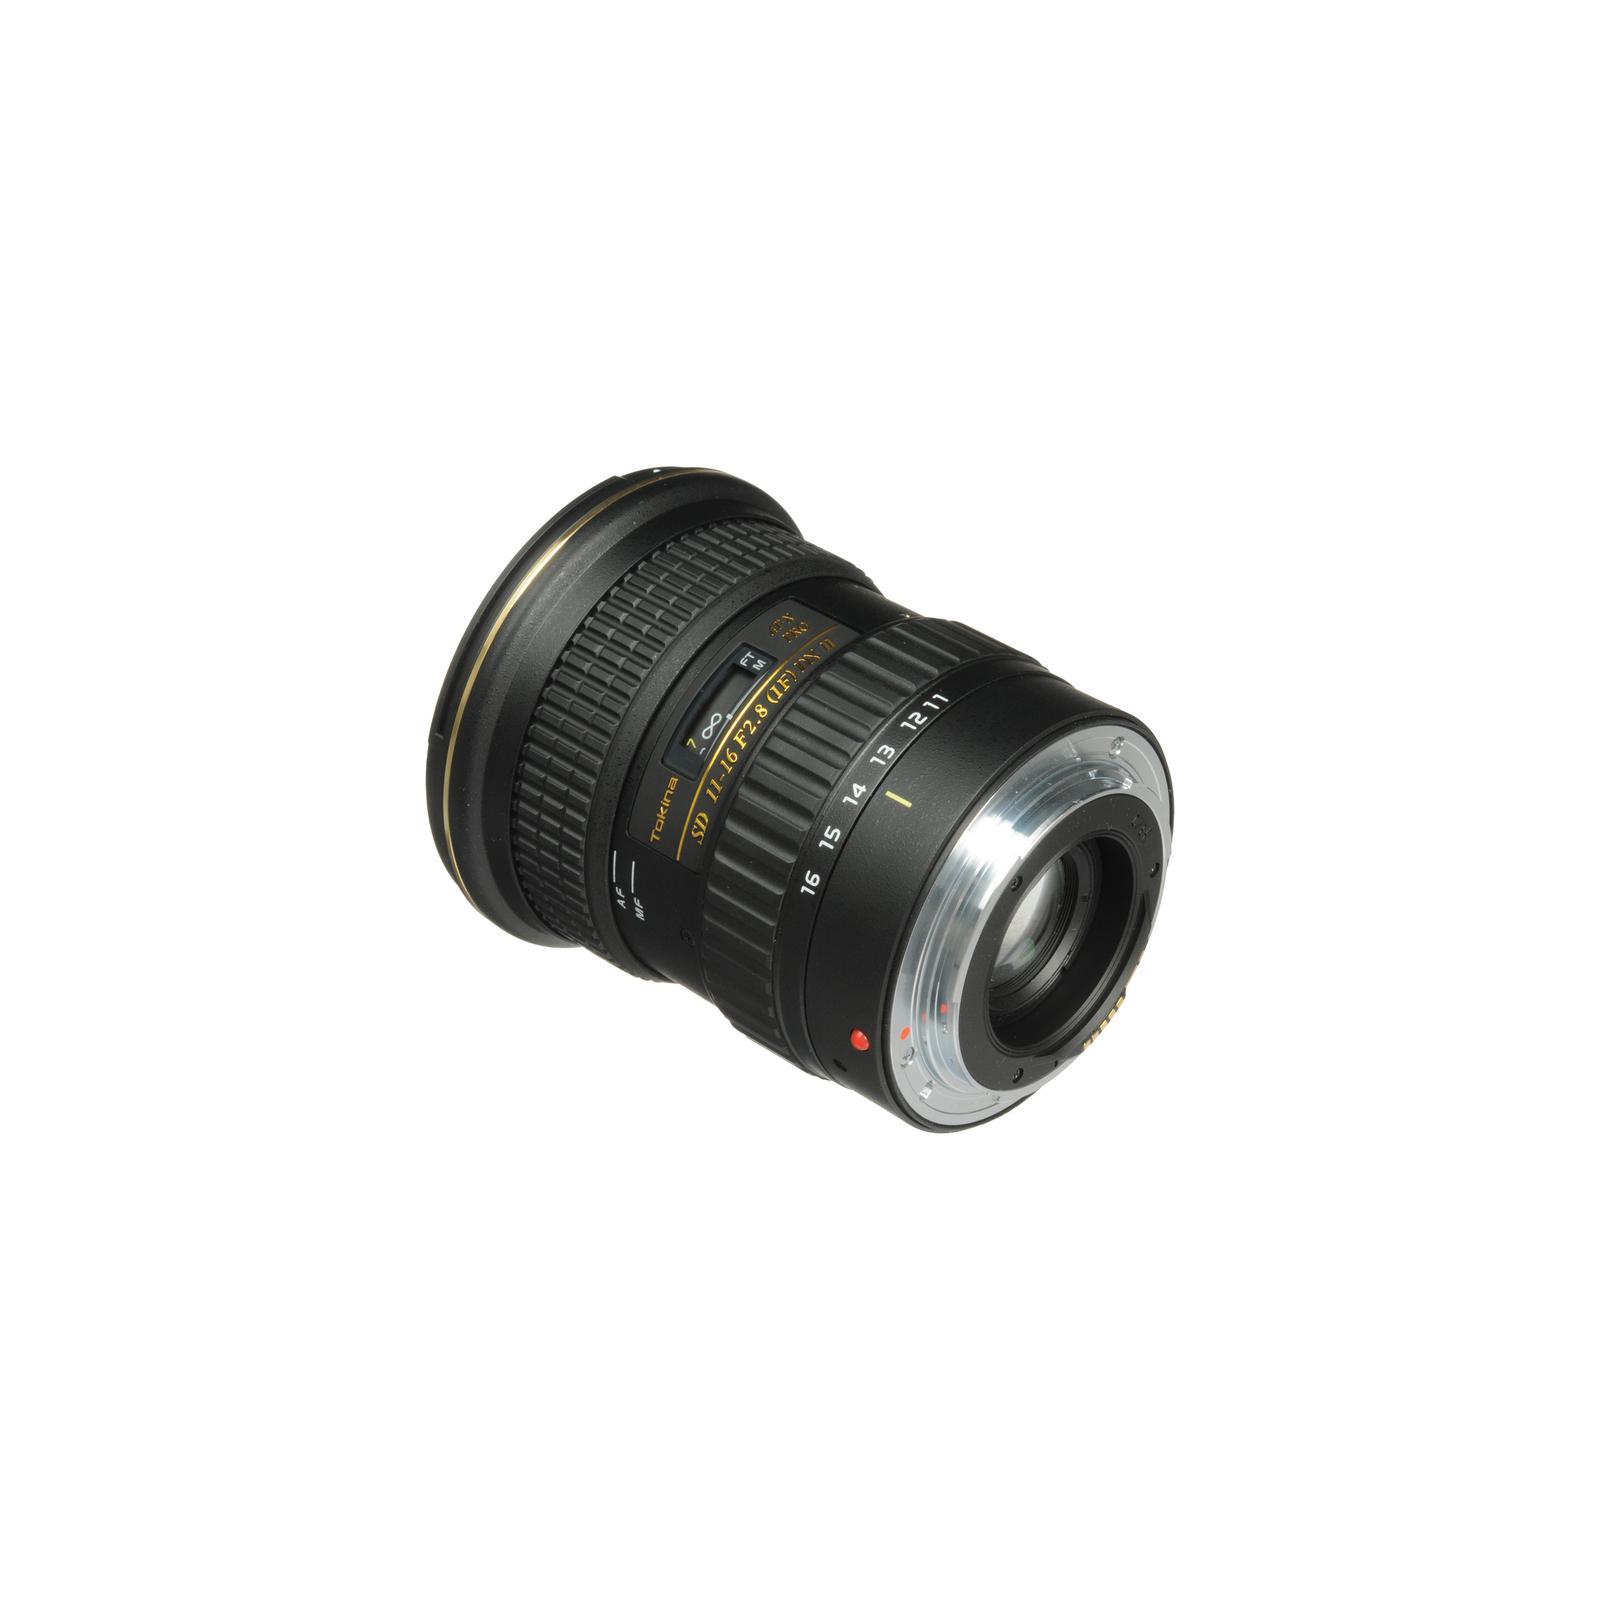 Объектив Tokina AT-X PRO DXII 11-16mm f/2.8 (Canon) (ATXAF116DXIIC) изображение 3